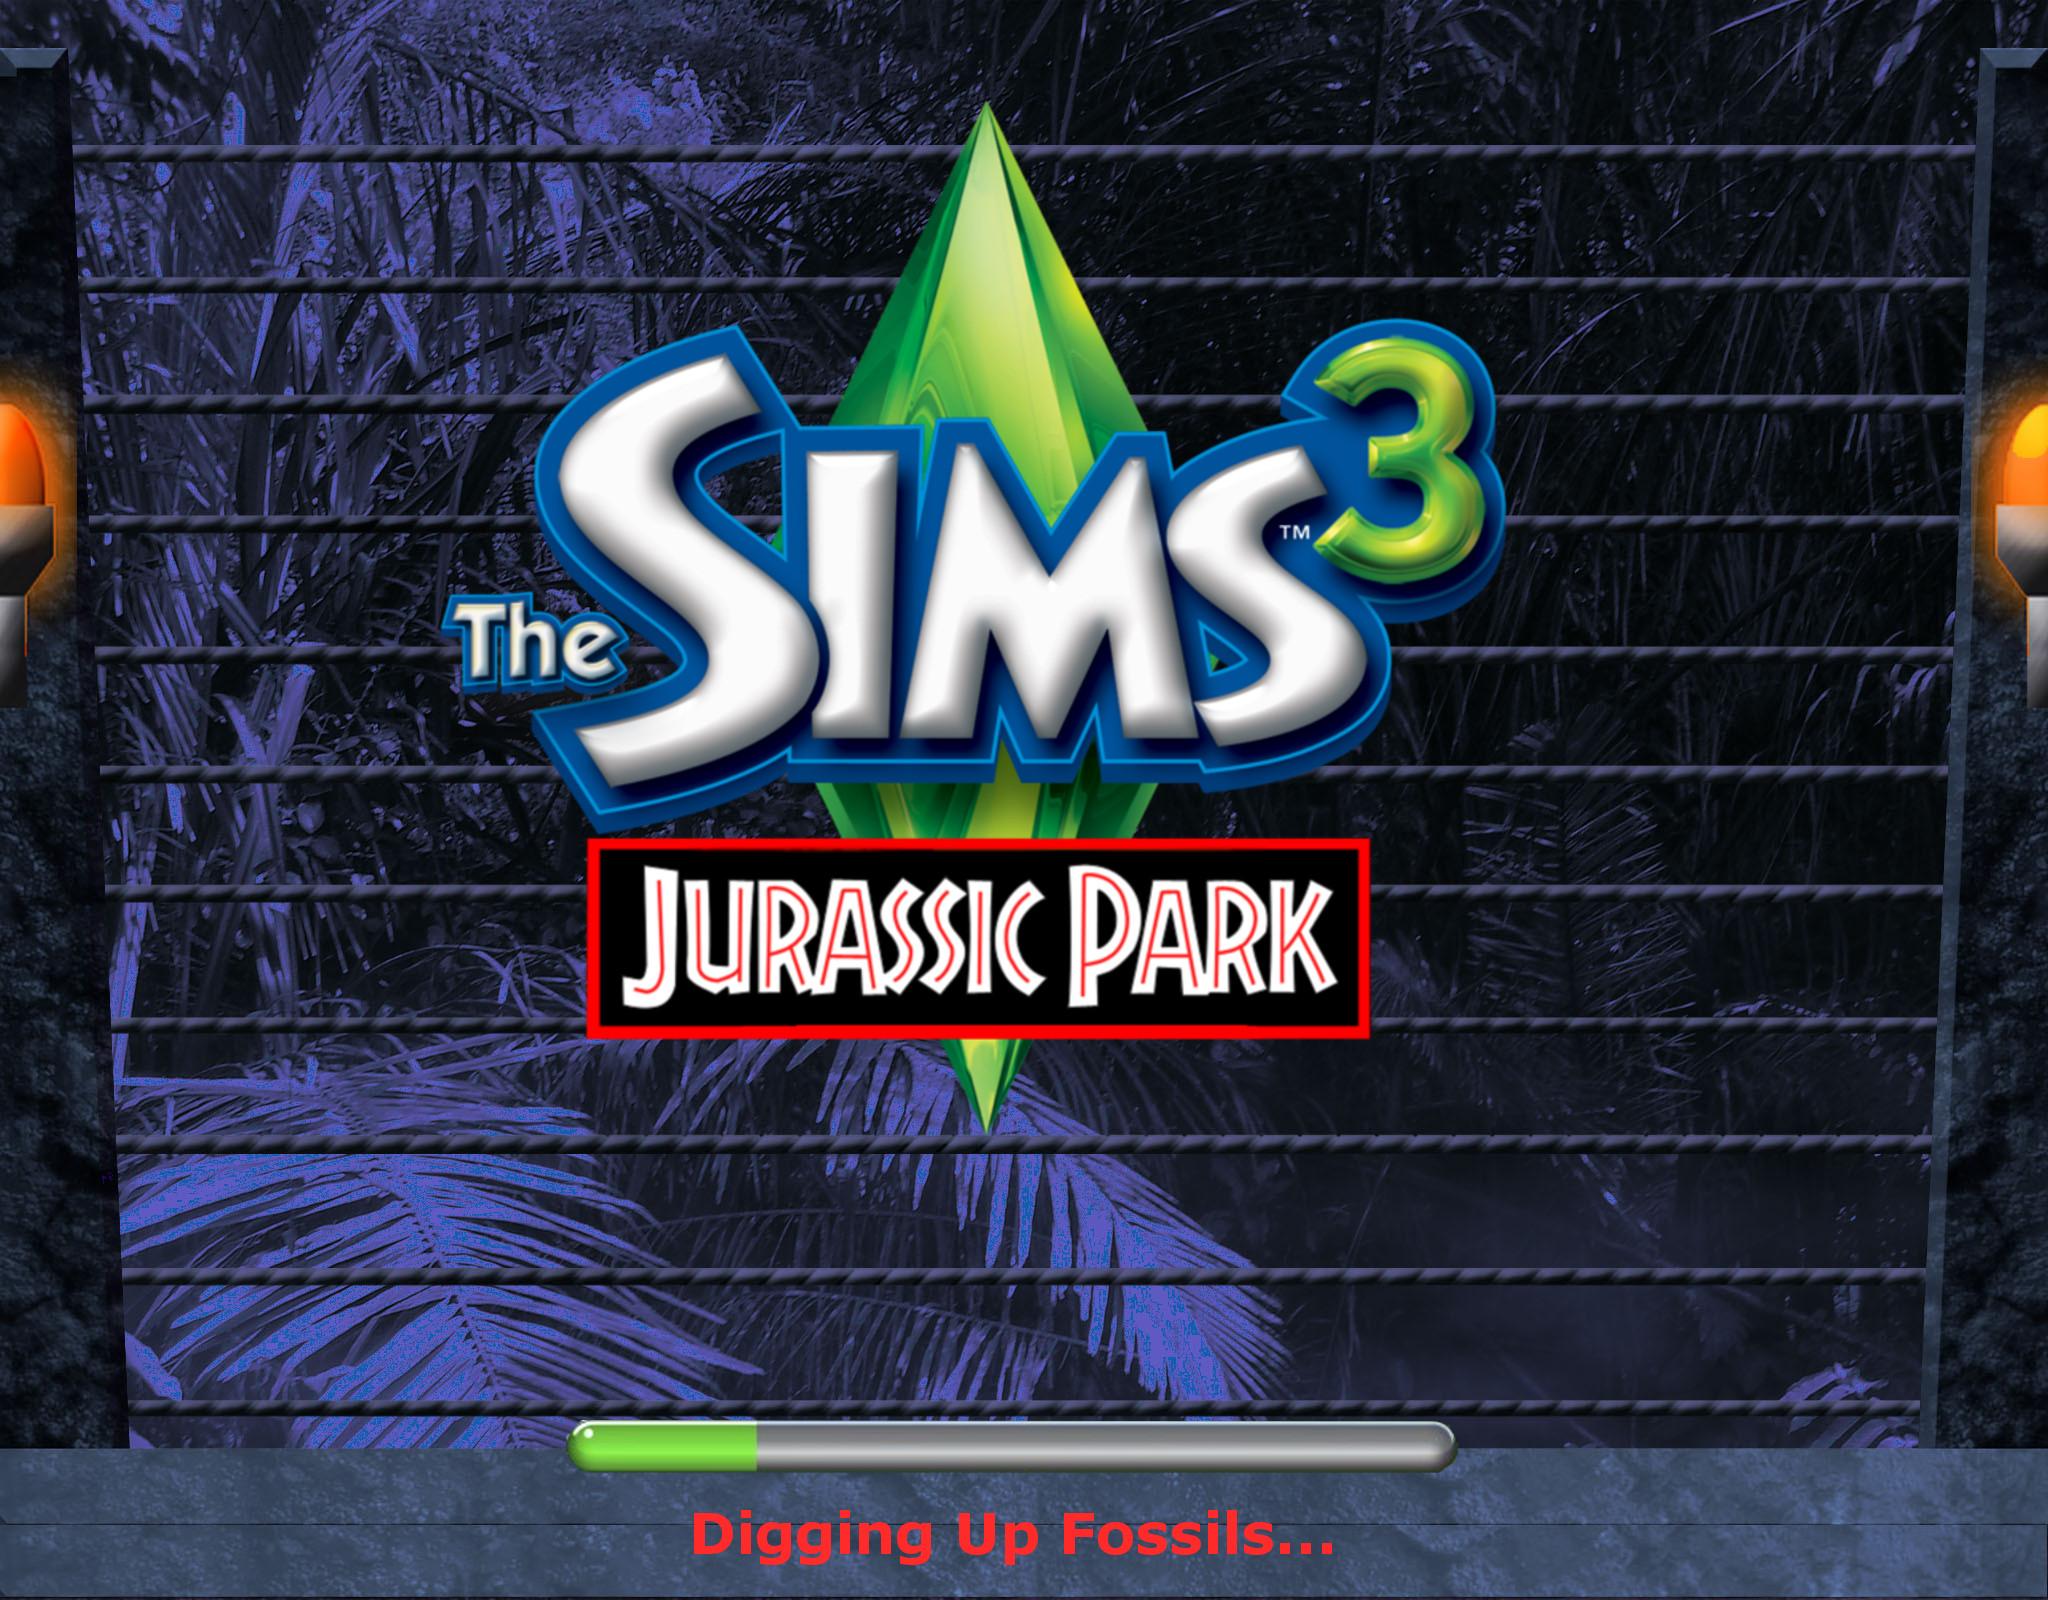 The Sims 3: Jurassic Park